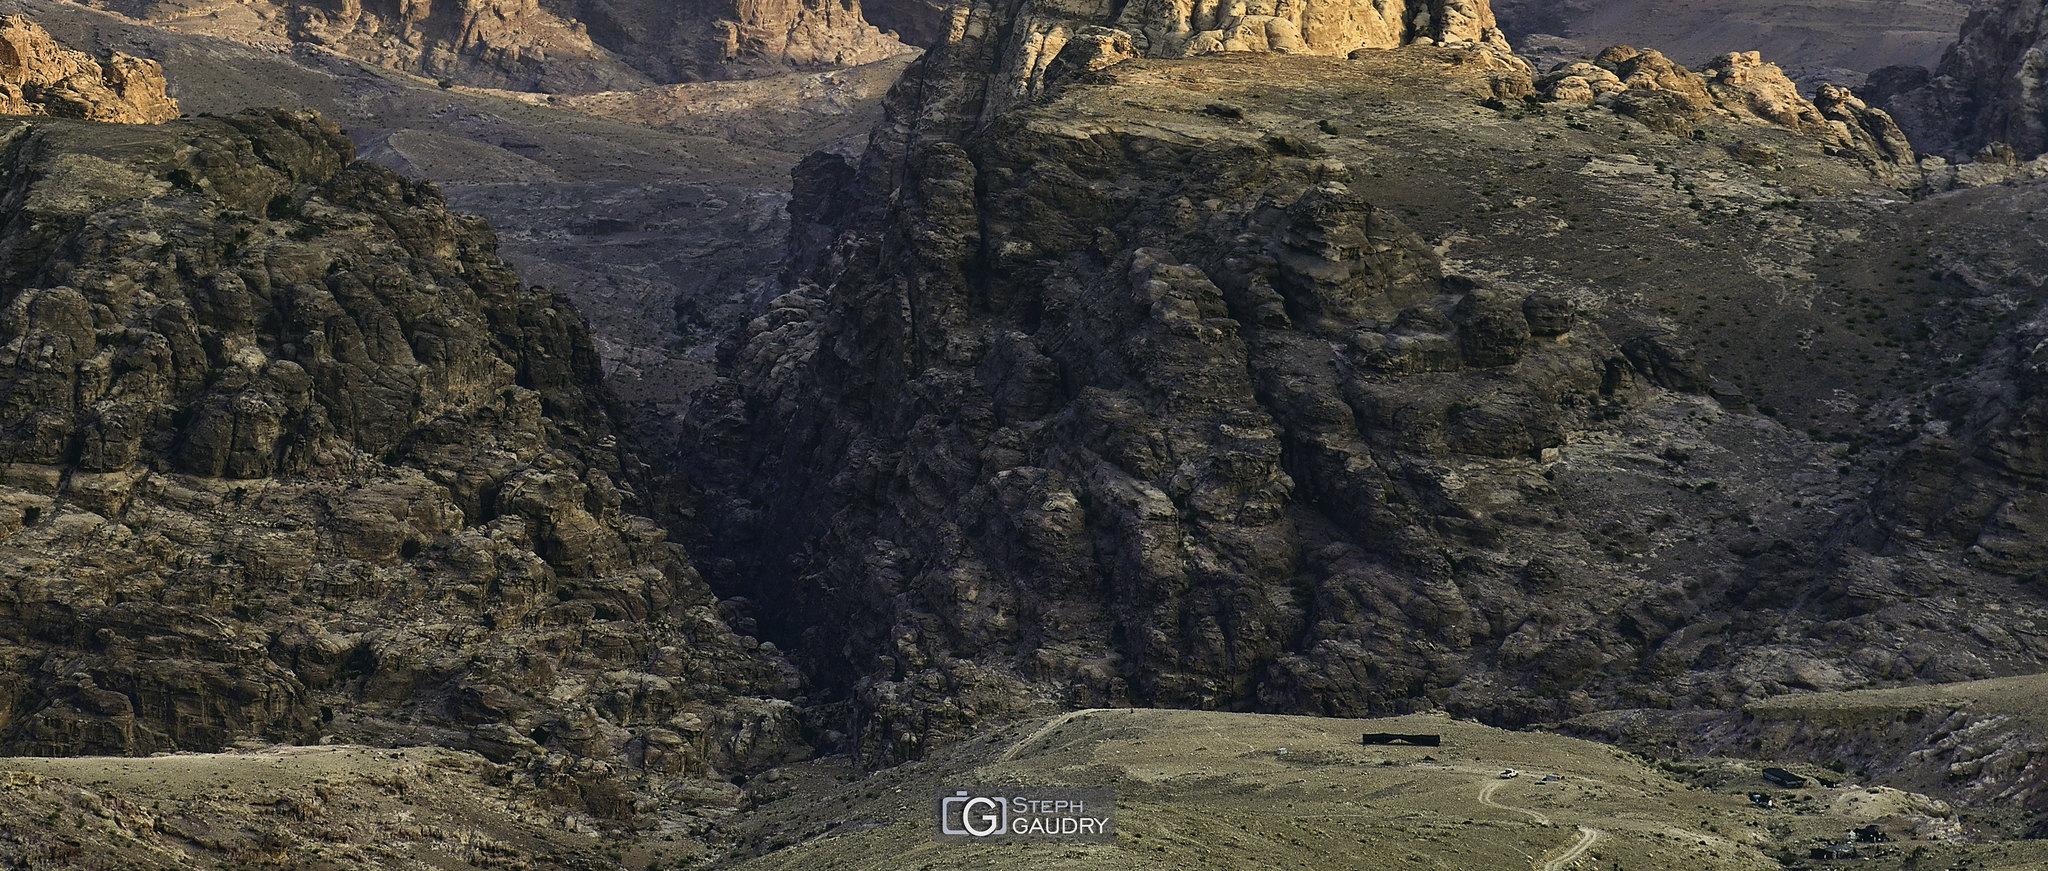 Campement nomade à Ayn Ammūn [Click to start slideshow]